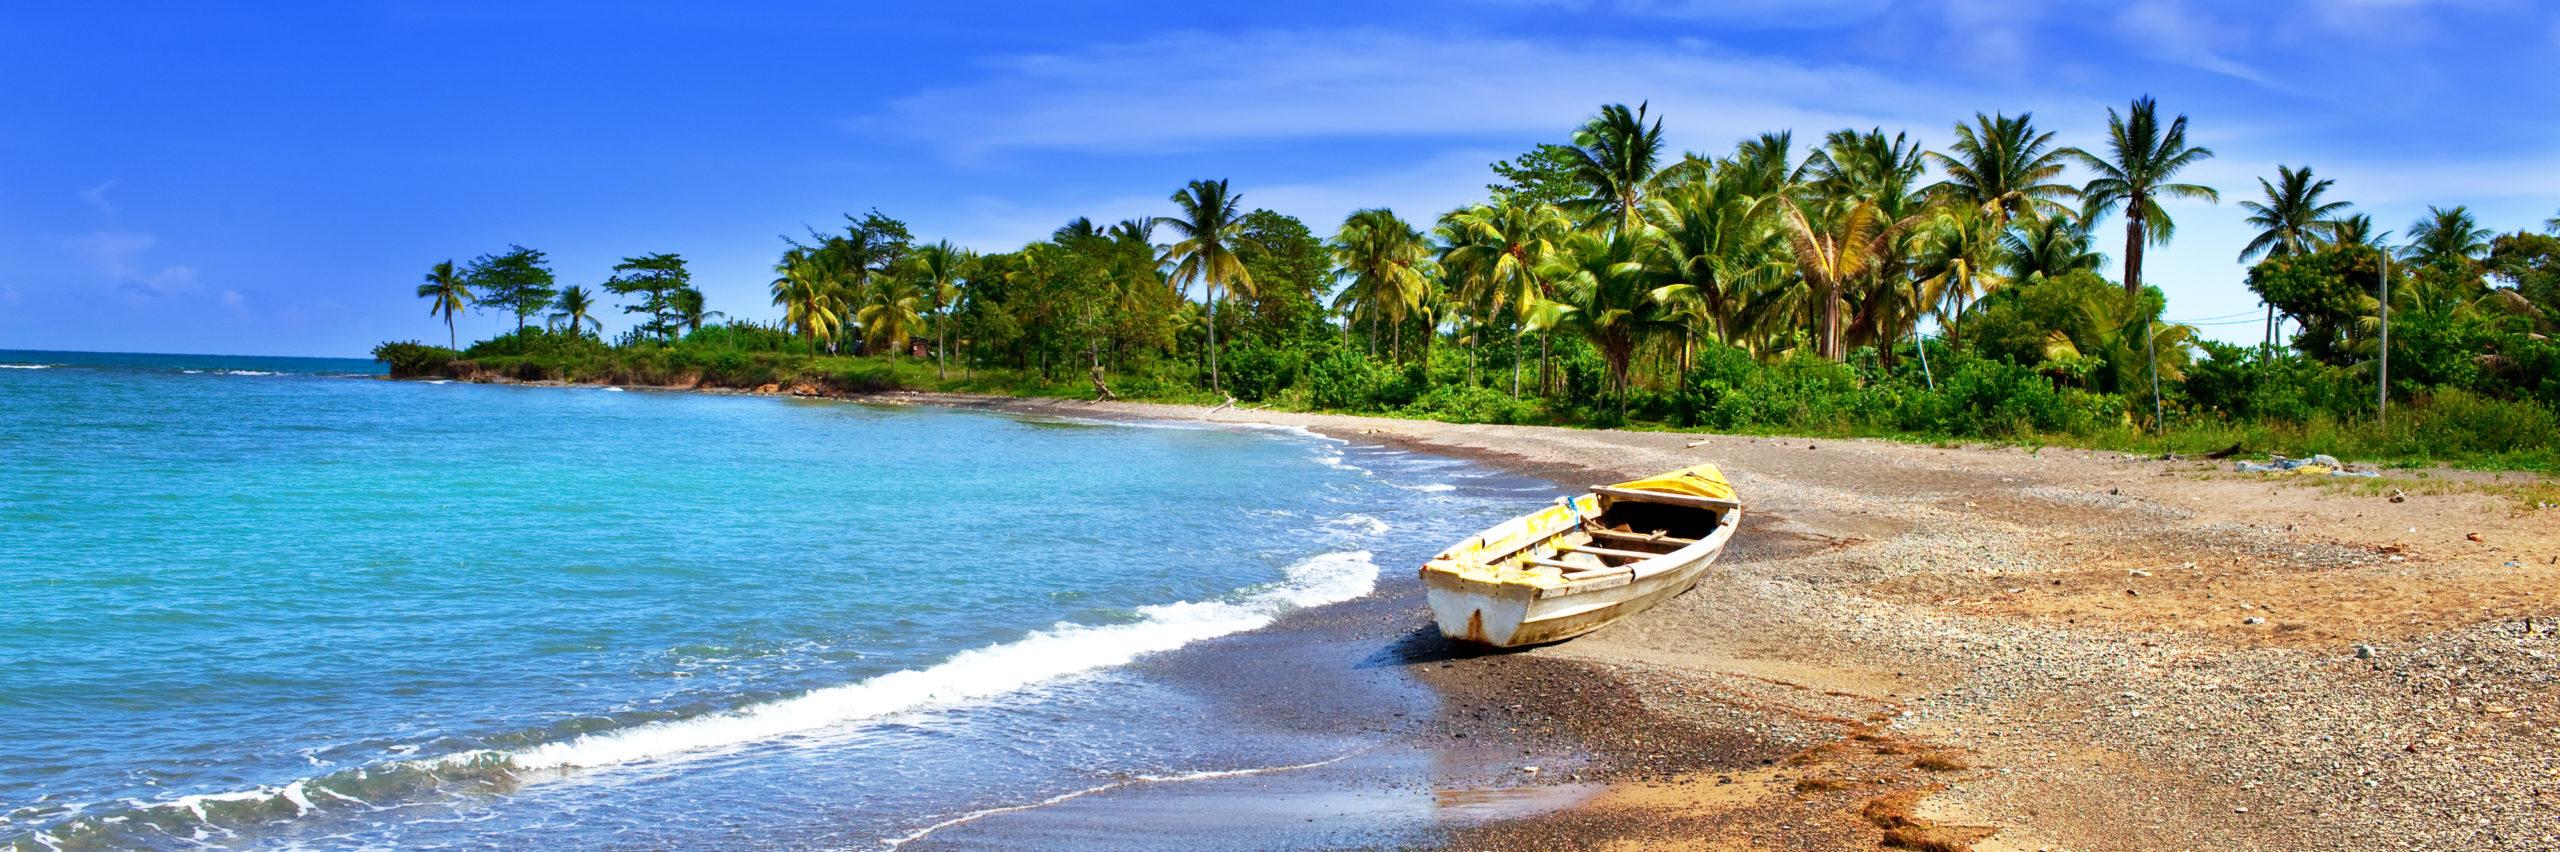 Jamaica [Shutterstock]